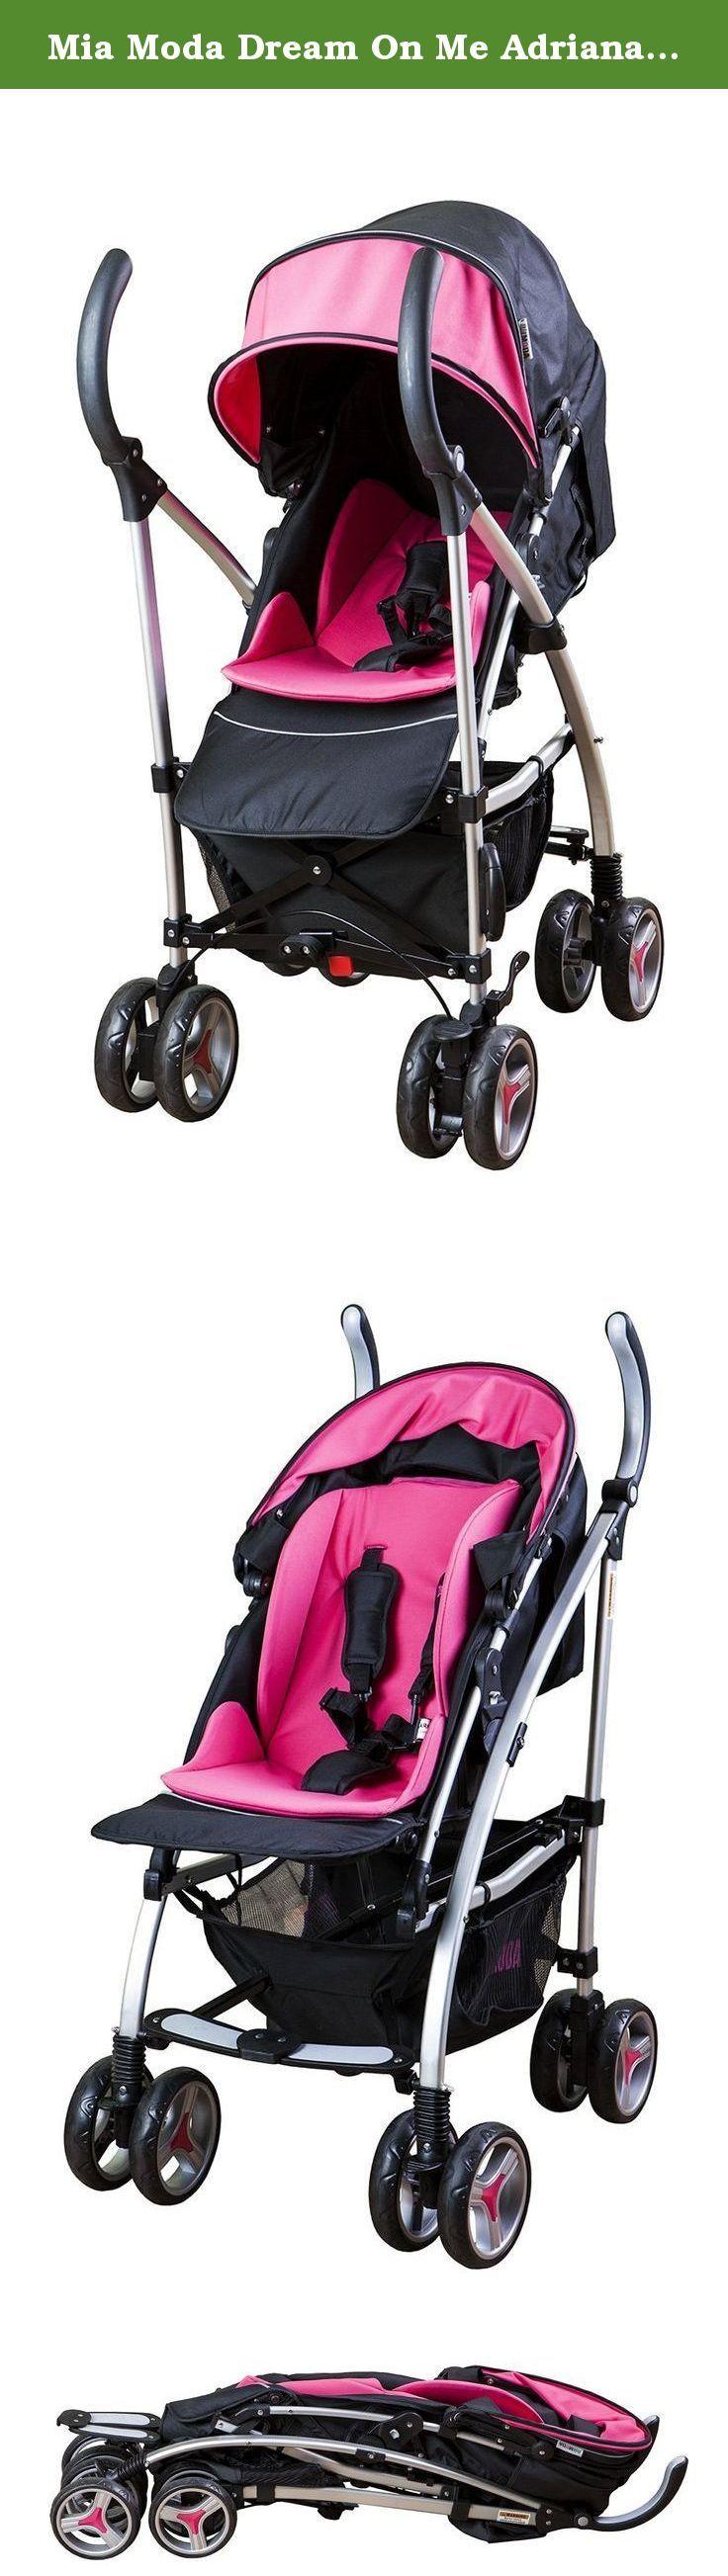 Mia Moda Dream On Me Adriana Reversible Seat Stroller Pink